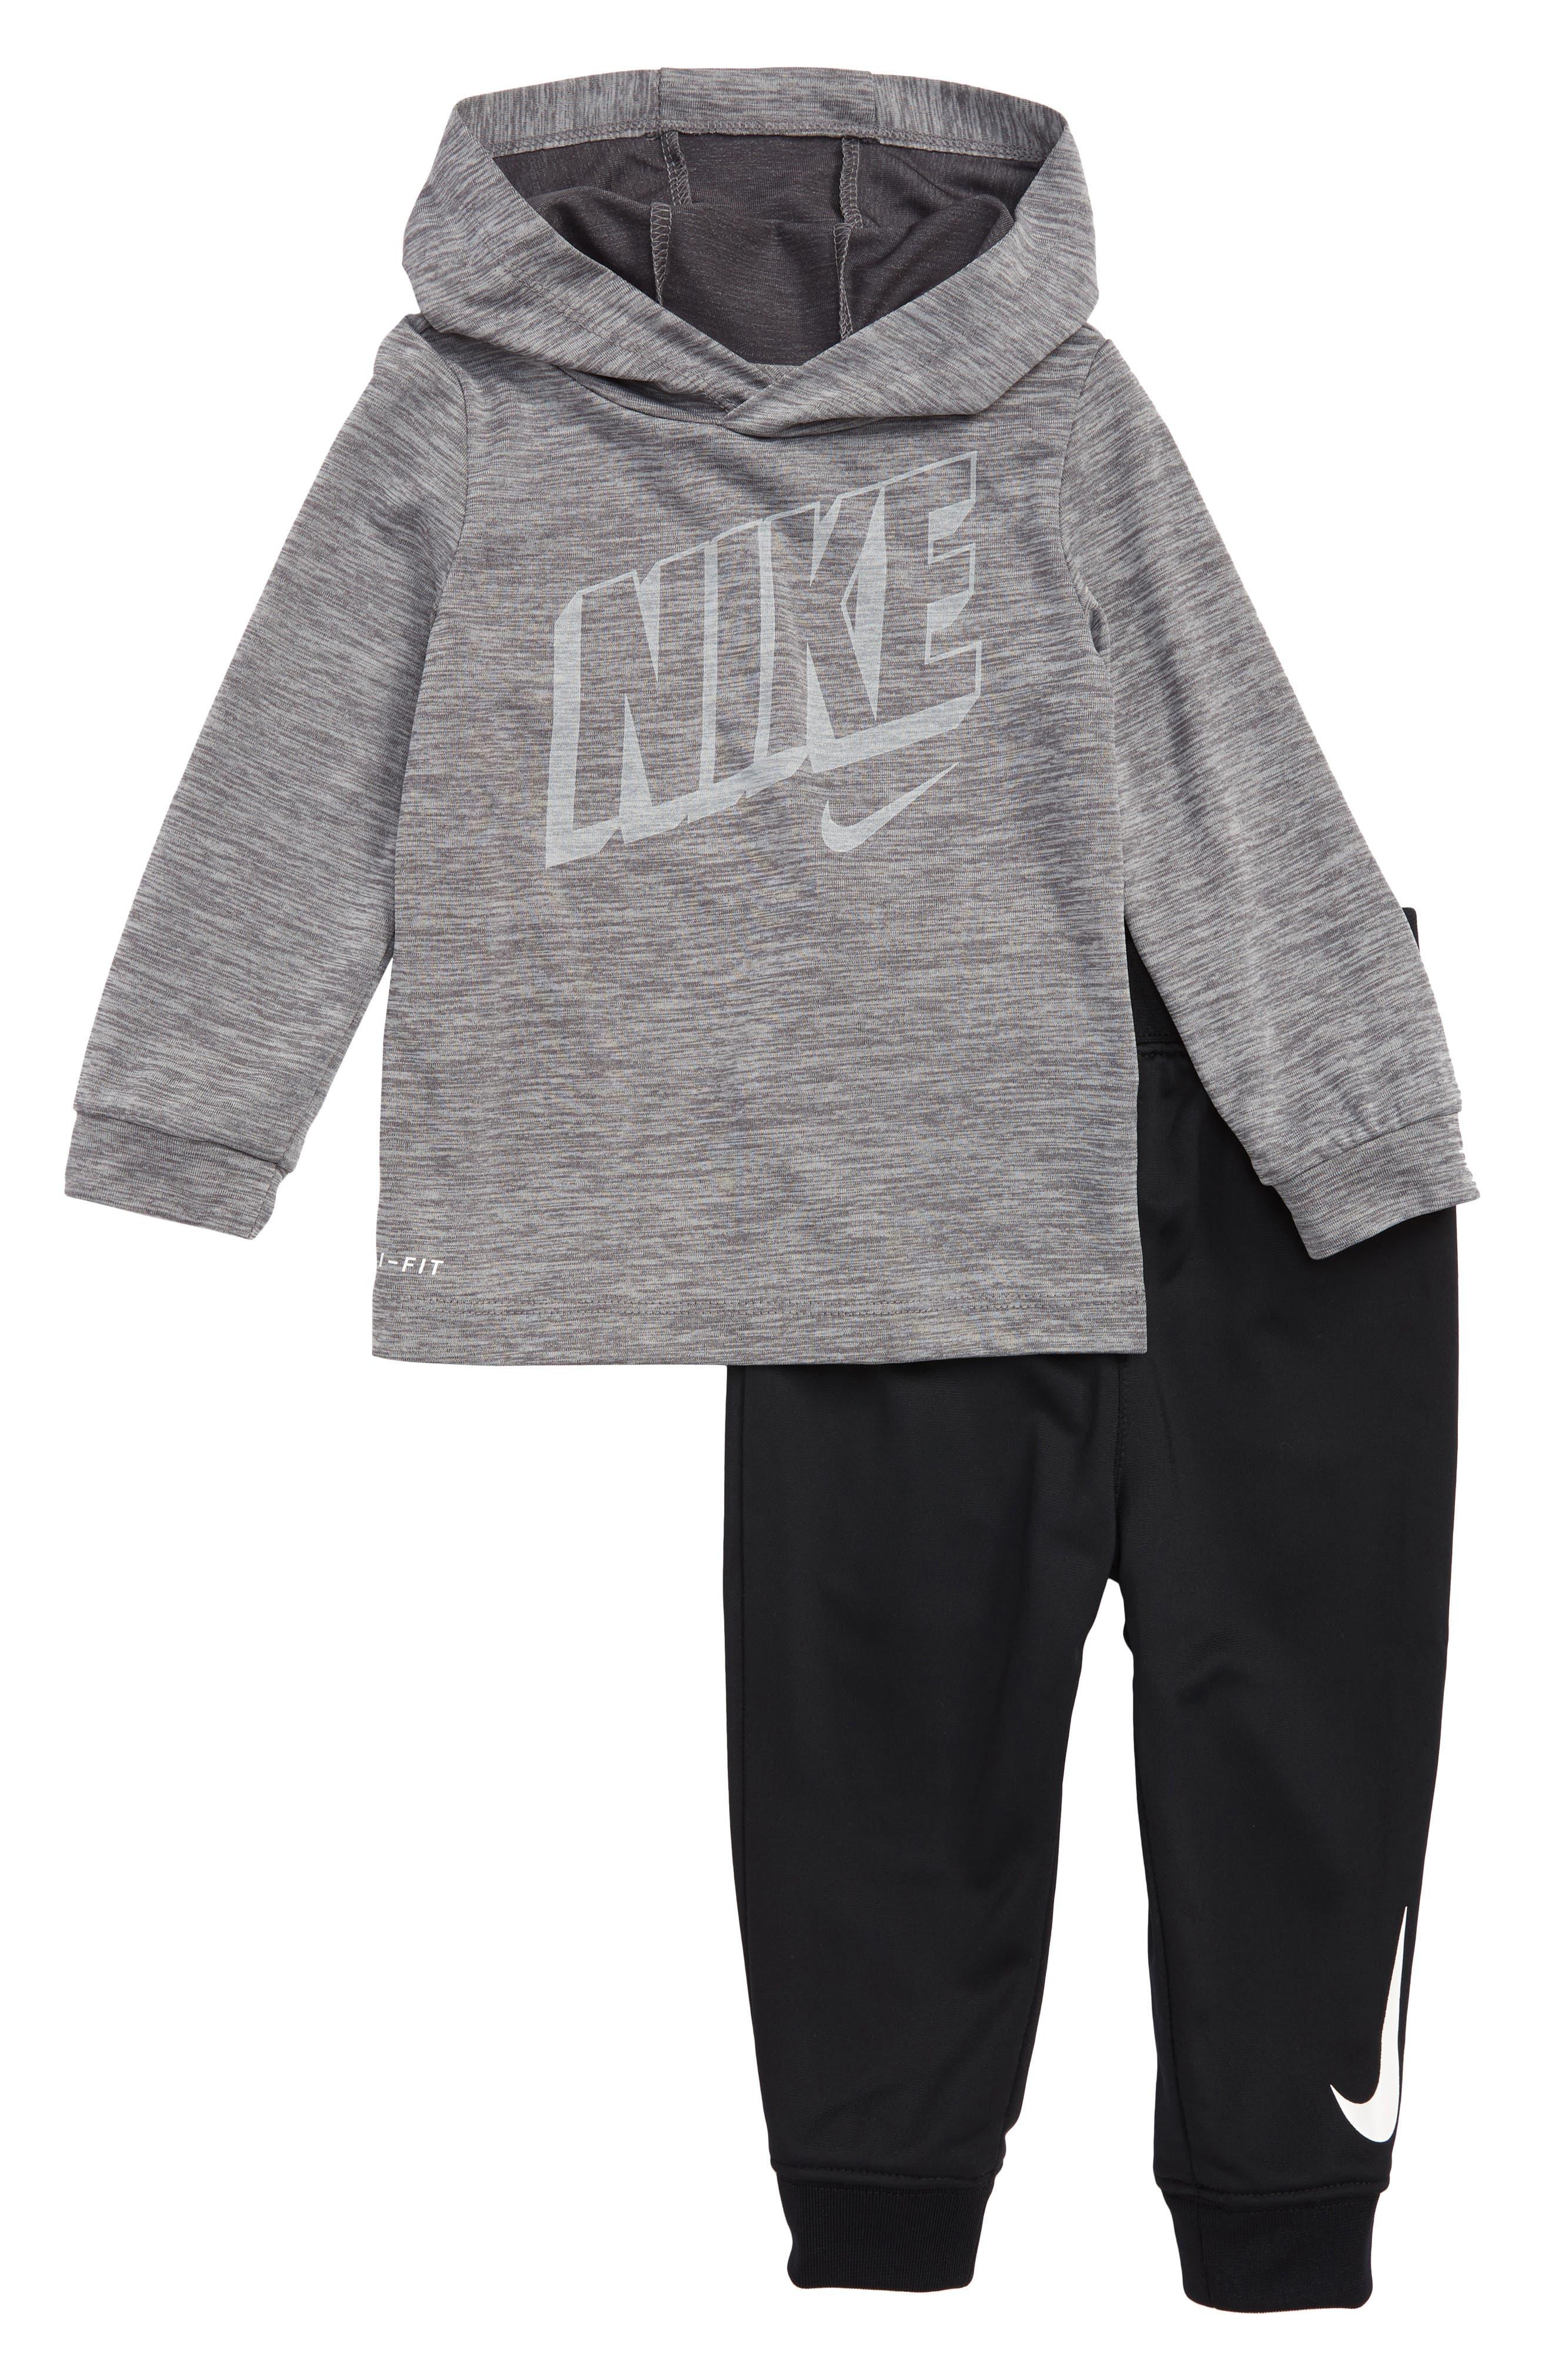 Infant Boys Nike DriFit Hoodie  Jogger Pants Set